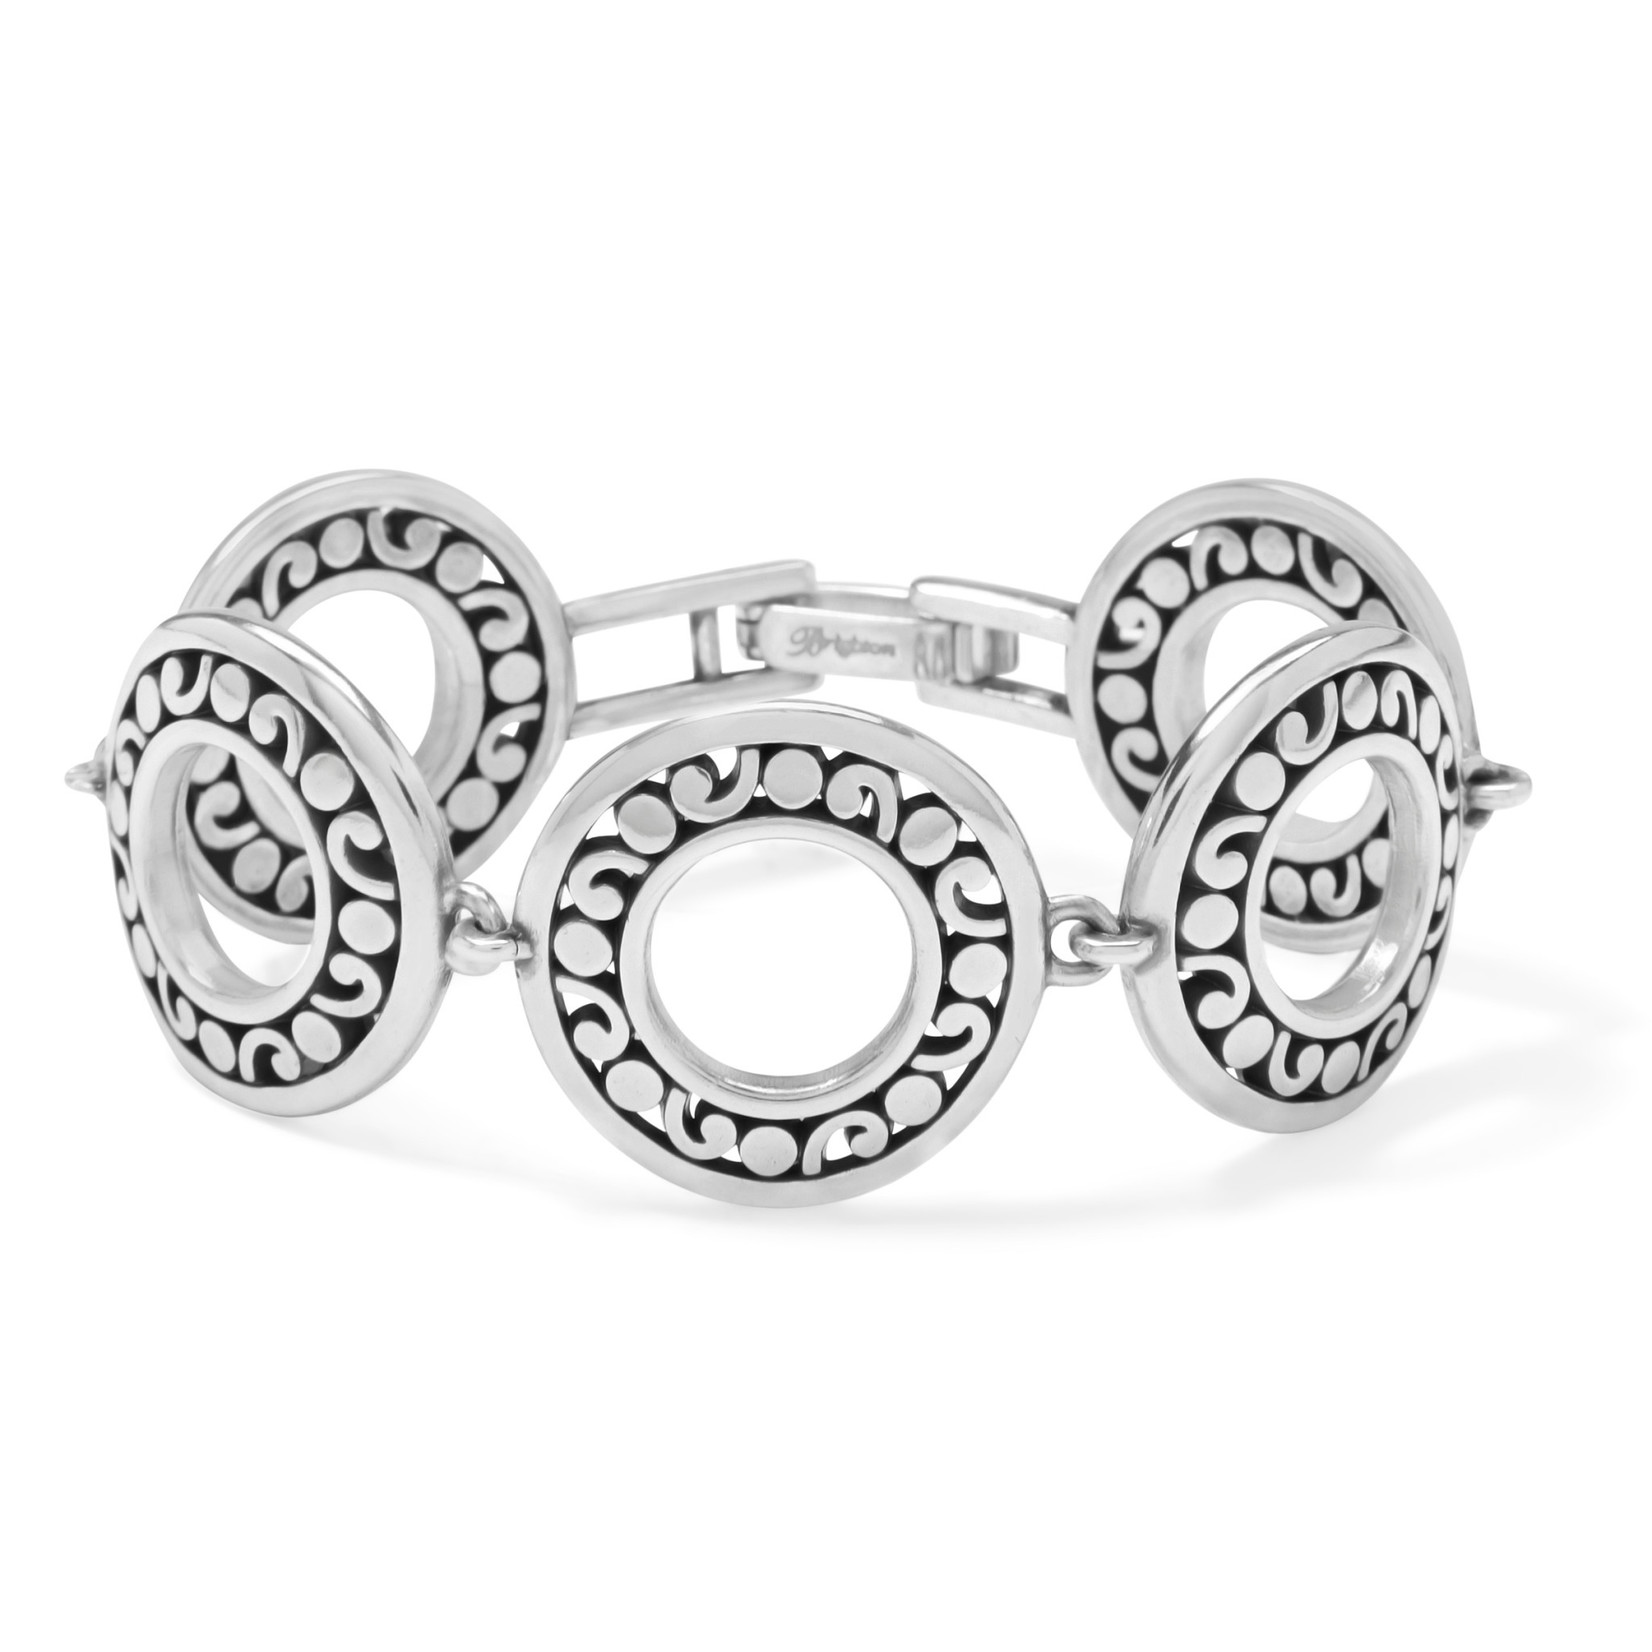 Brighton Contempo Open Ring Bracelet